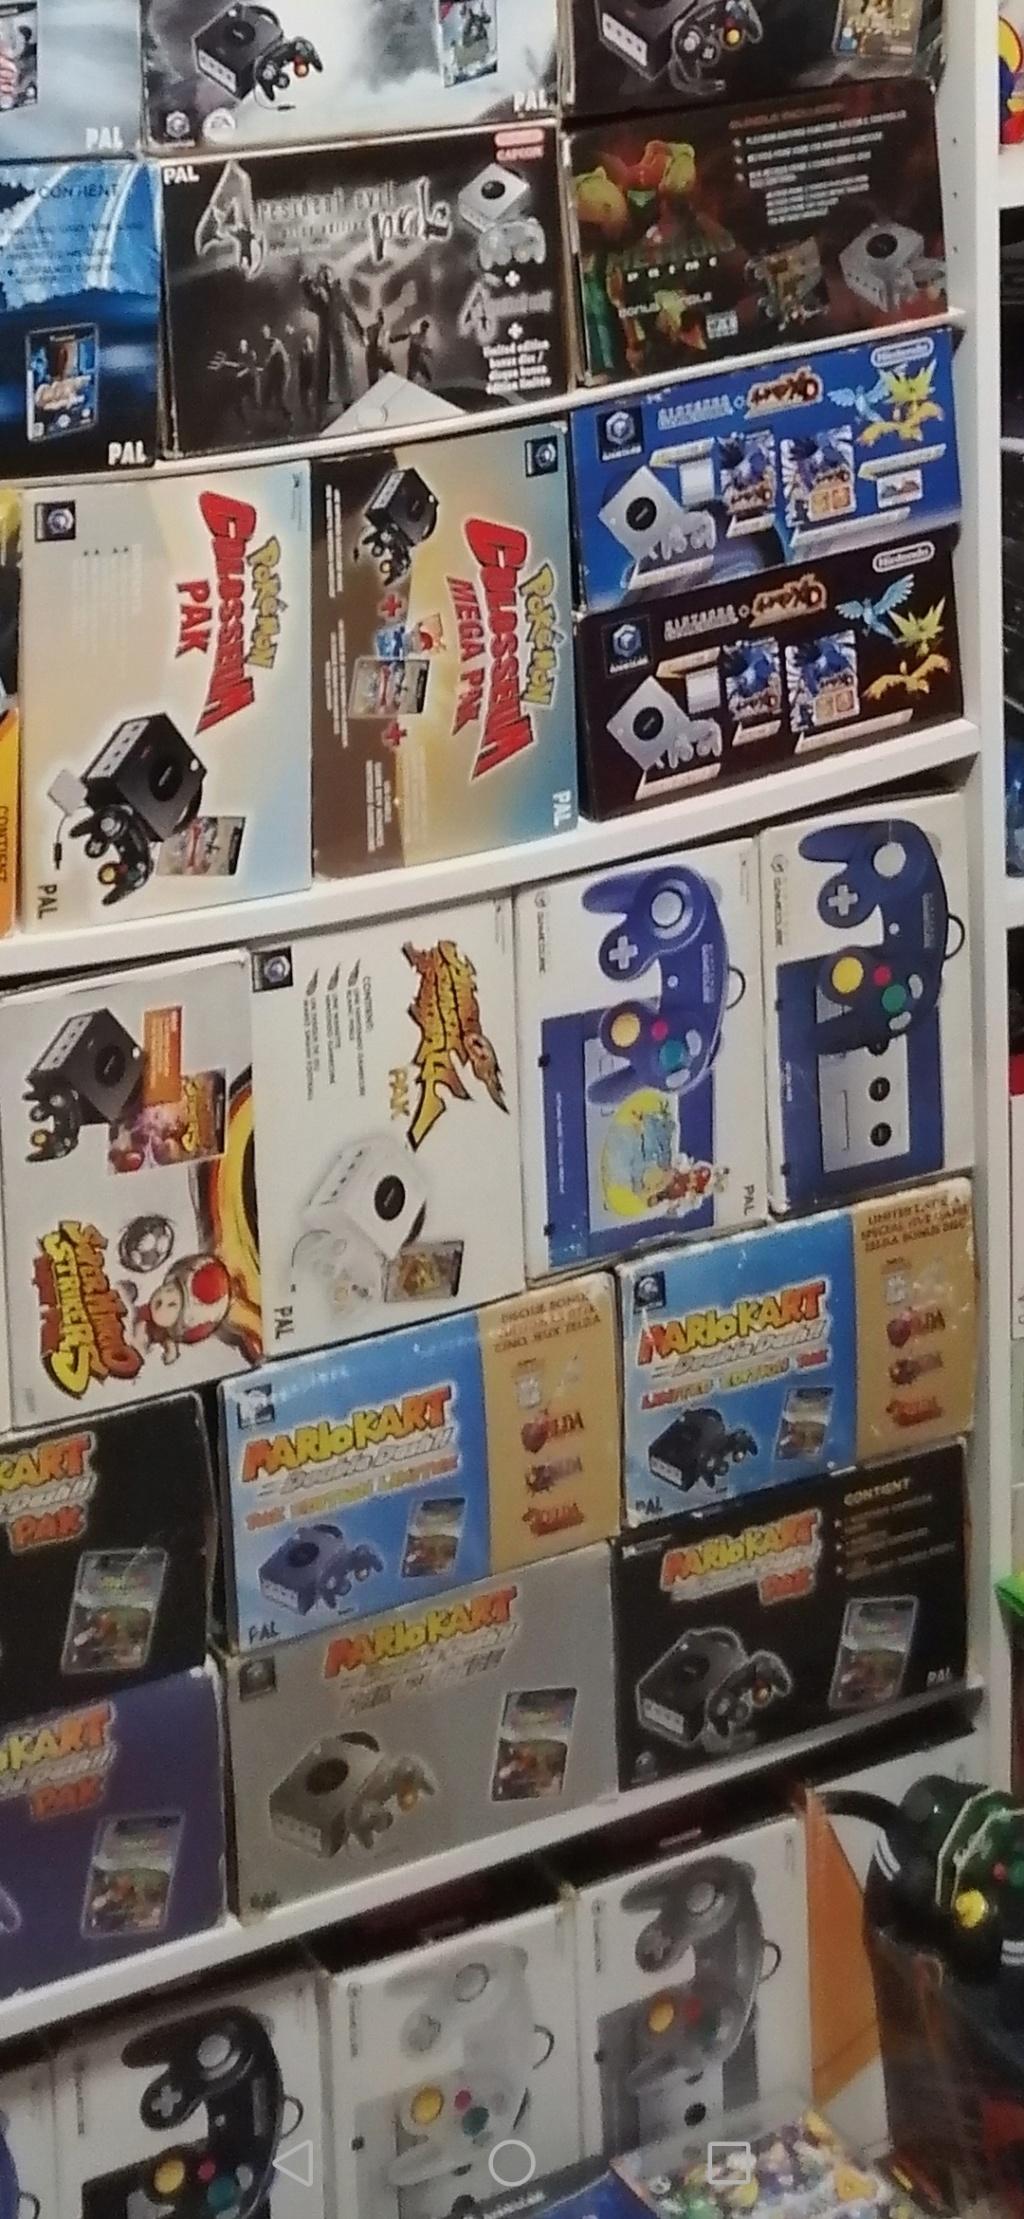 Coloris GameCube lors de la sortie de la console en France - Page 2 Screen10